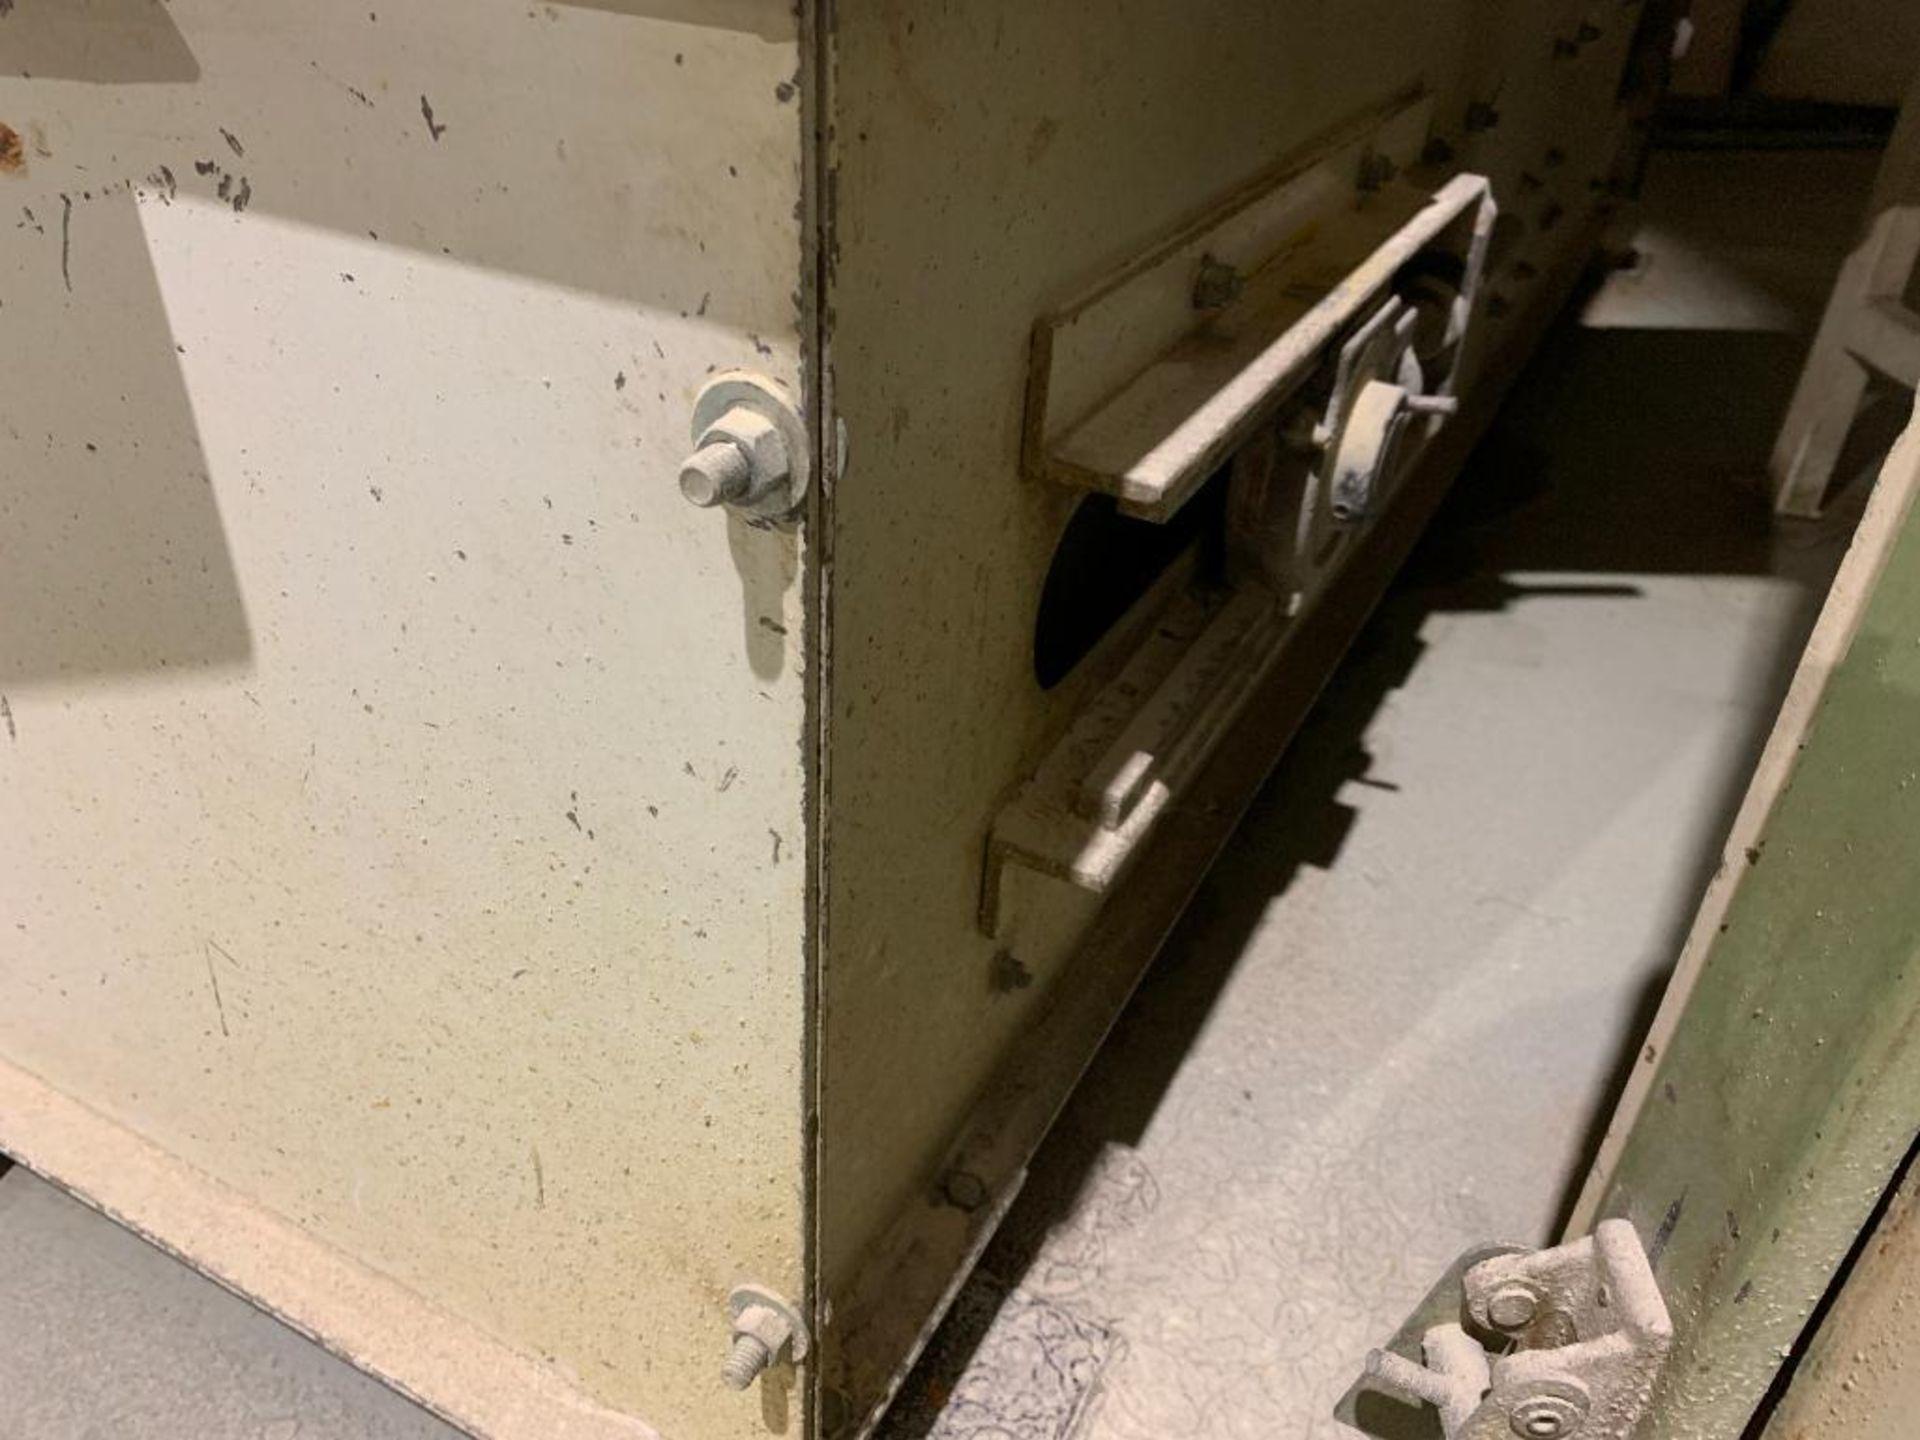 Meyer overlapping bucket elevator, model PA462-24-S - Image 2 of 14